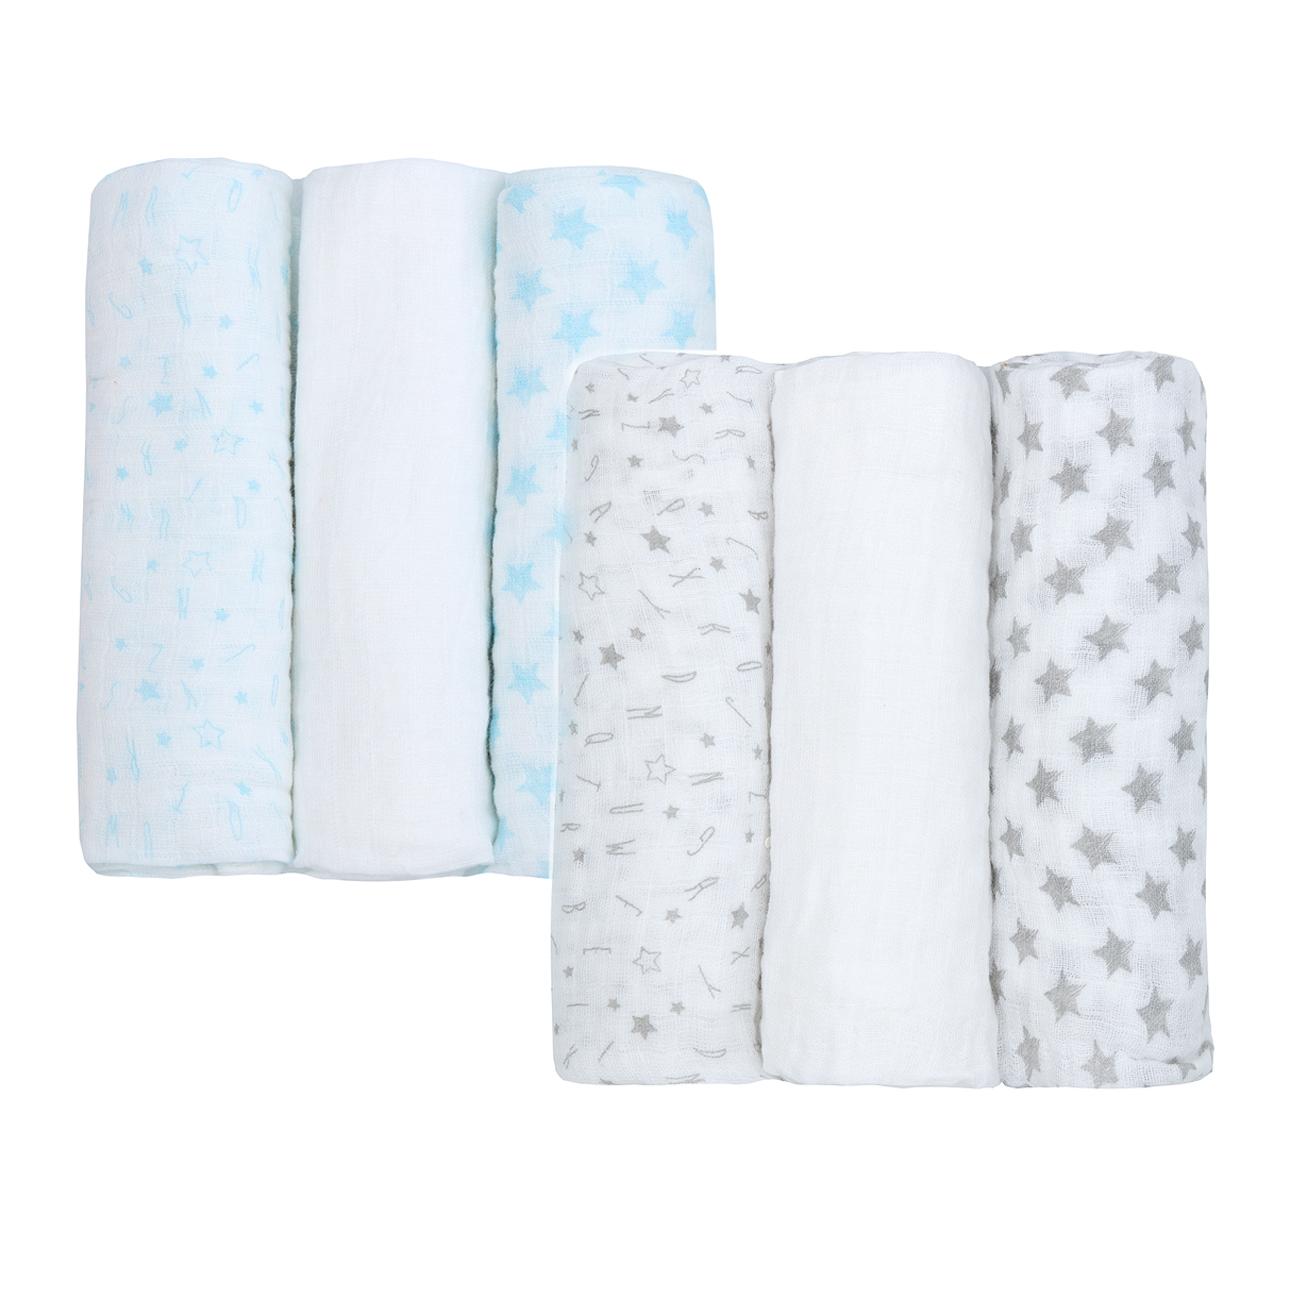 Newborn Cotton Muslin Square Burp Nappy Cloth Wipe 6-Pack Swaddle Blanket 76x76